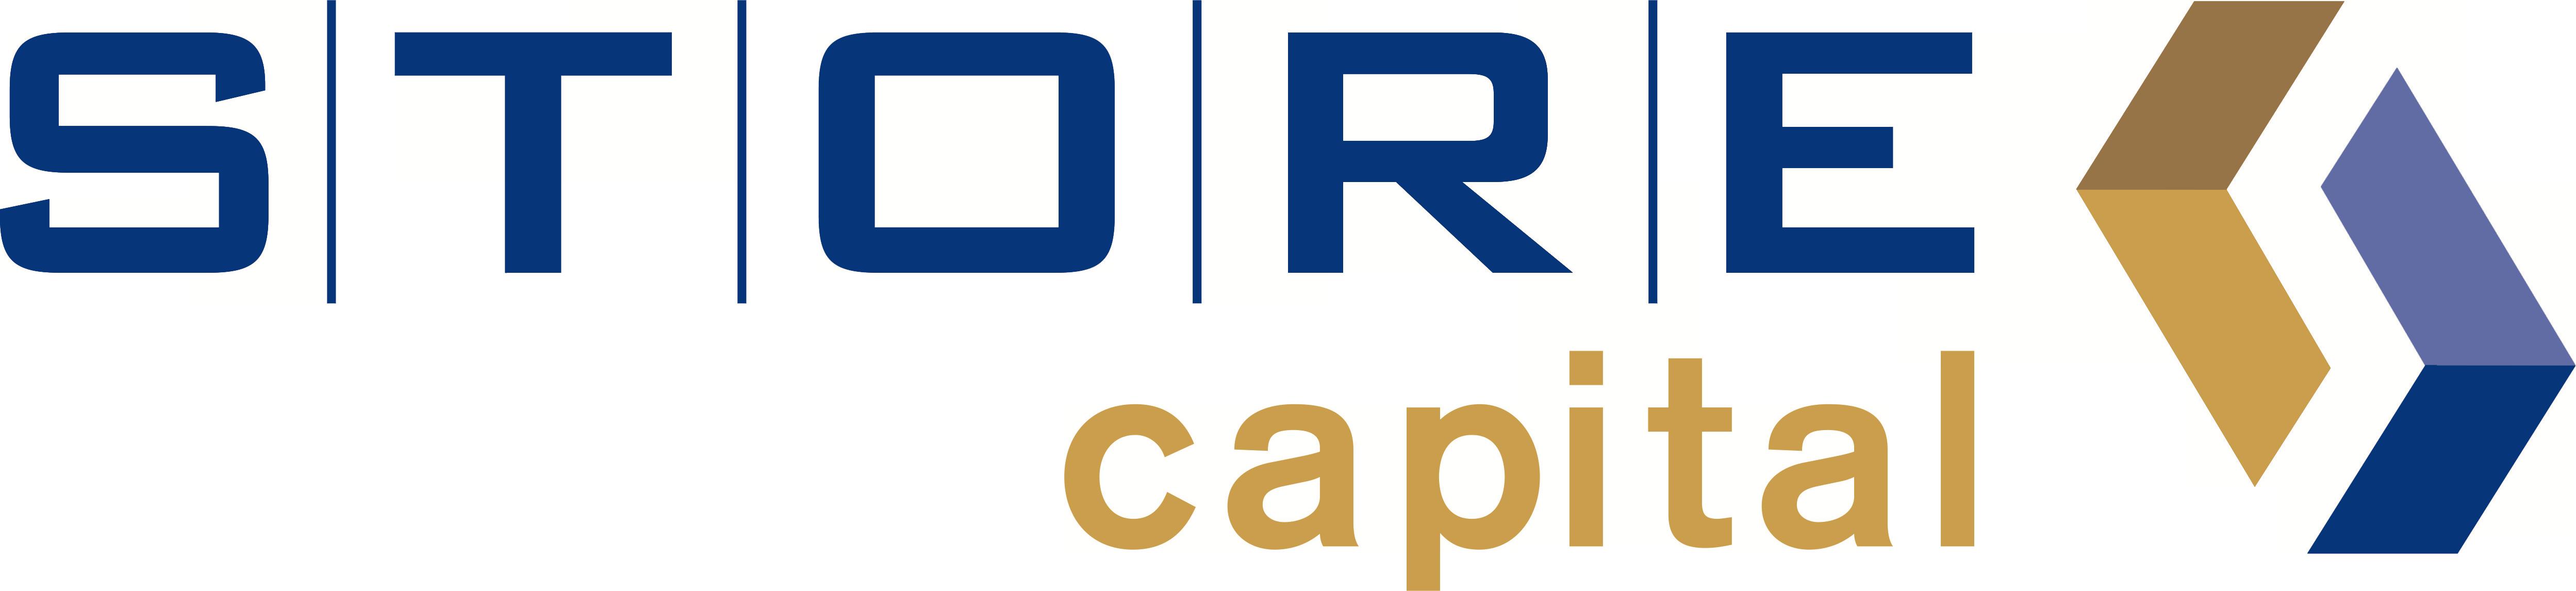 STORE Capital Symbol